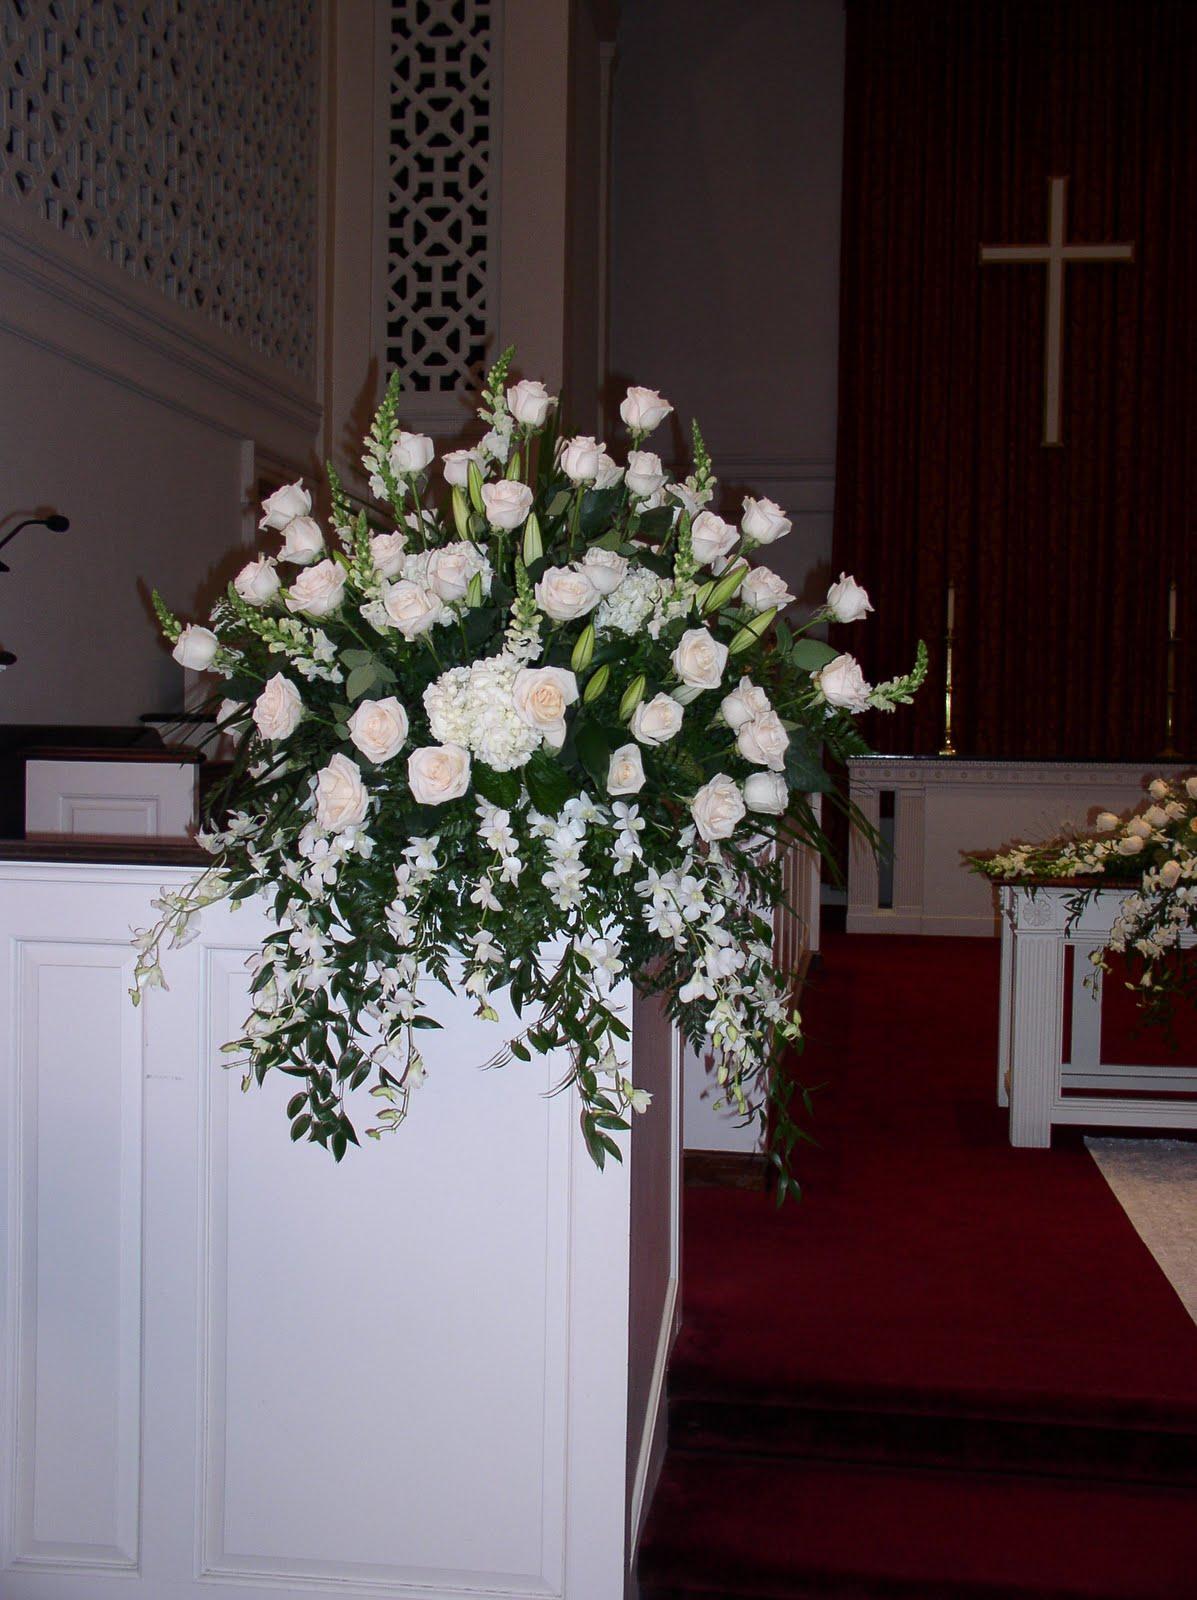 Sharon S Flowers Church Arrangements